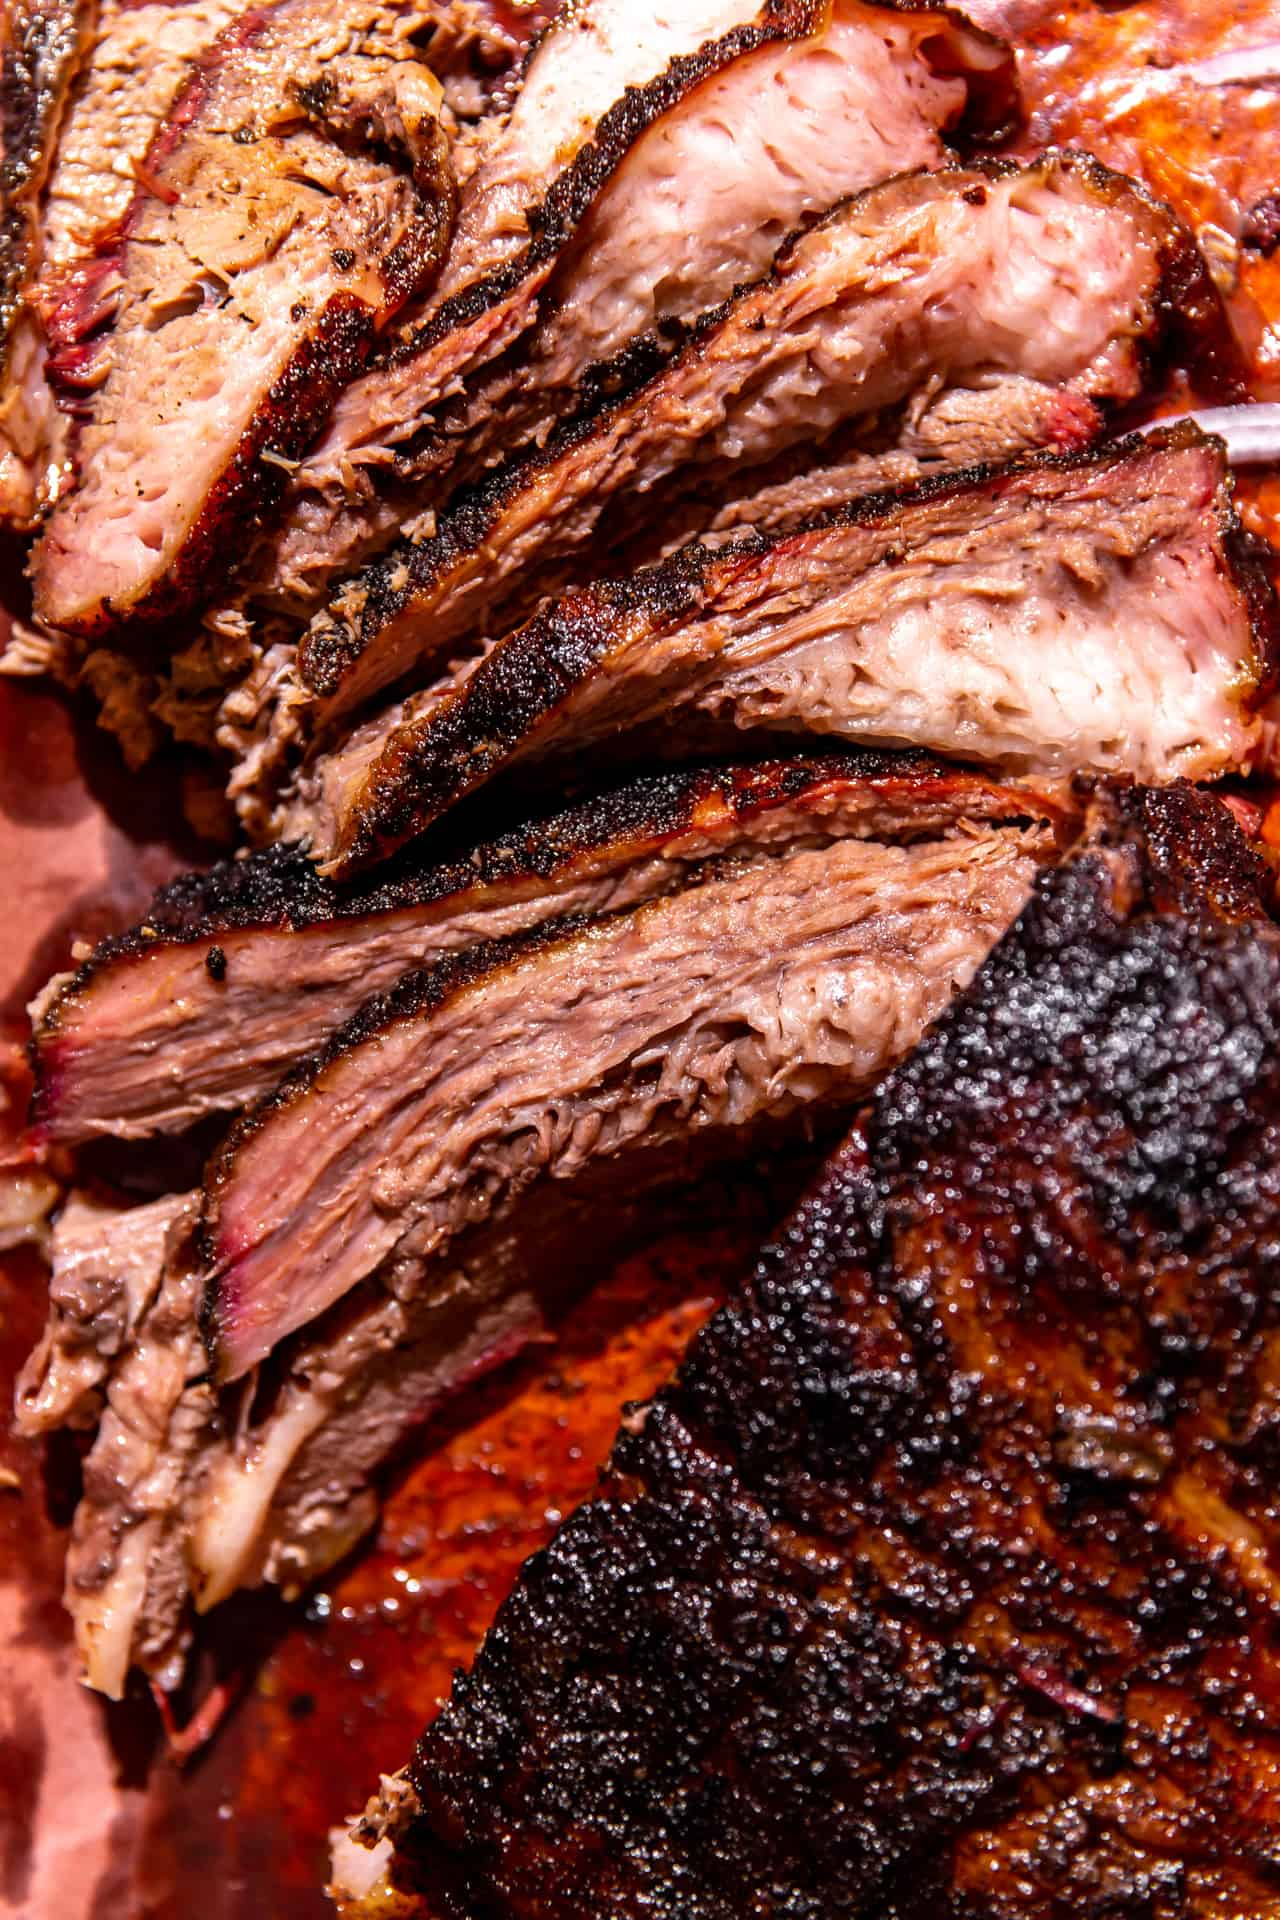 Sliced Texas Smoked Brisket on peach paper.